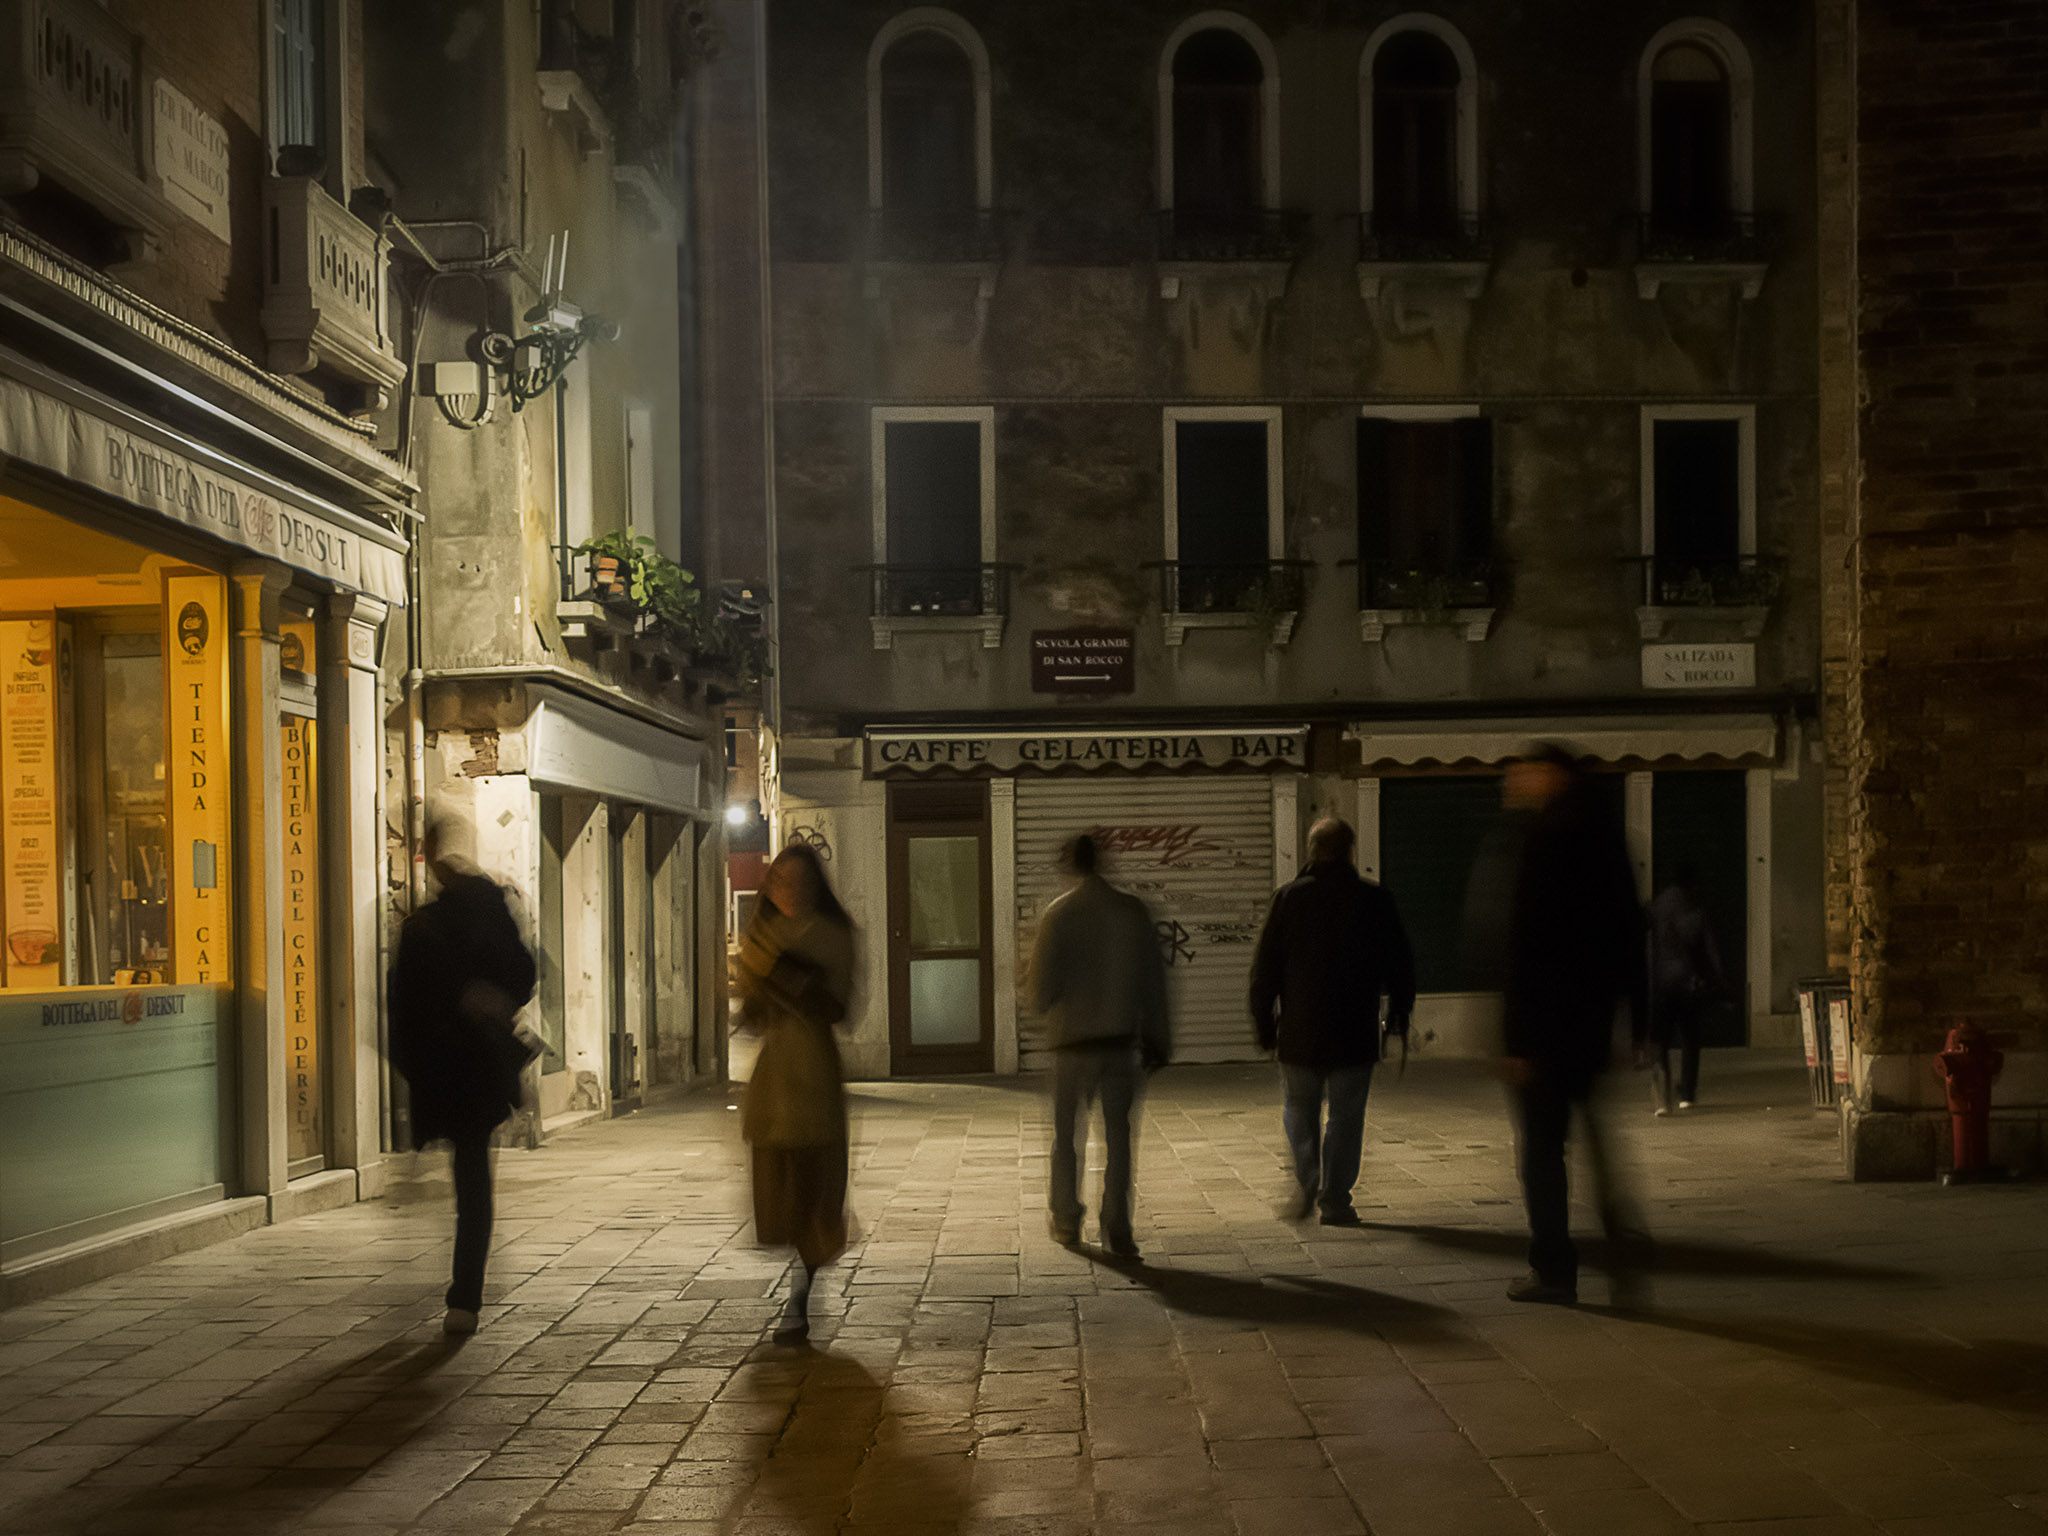 Melinda Isachsen JANIS Photography & Fine Art evening stroll Venice Italy